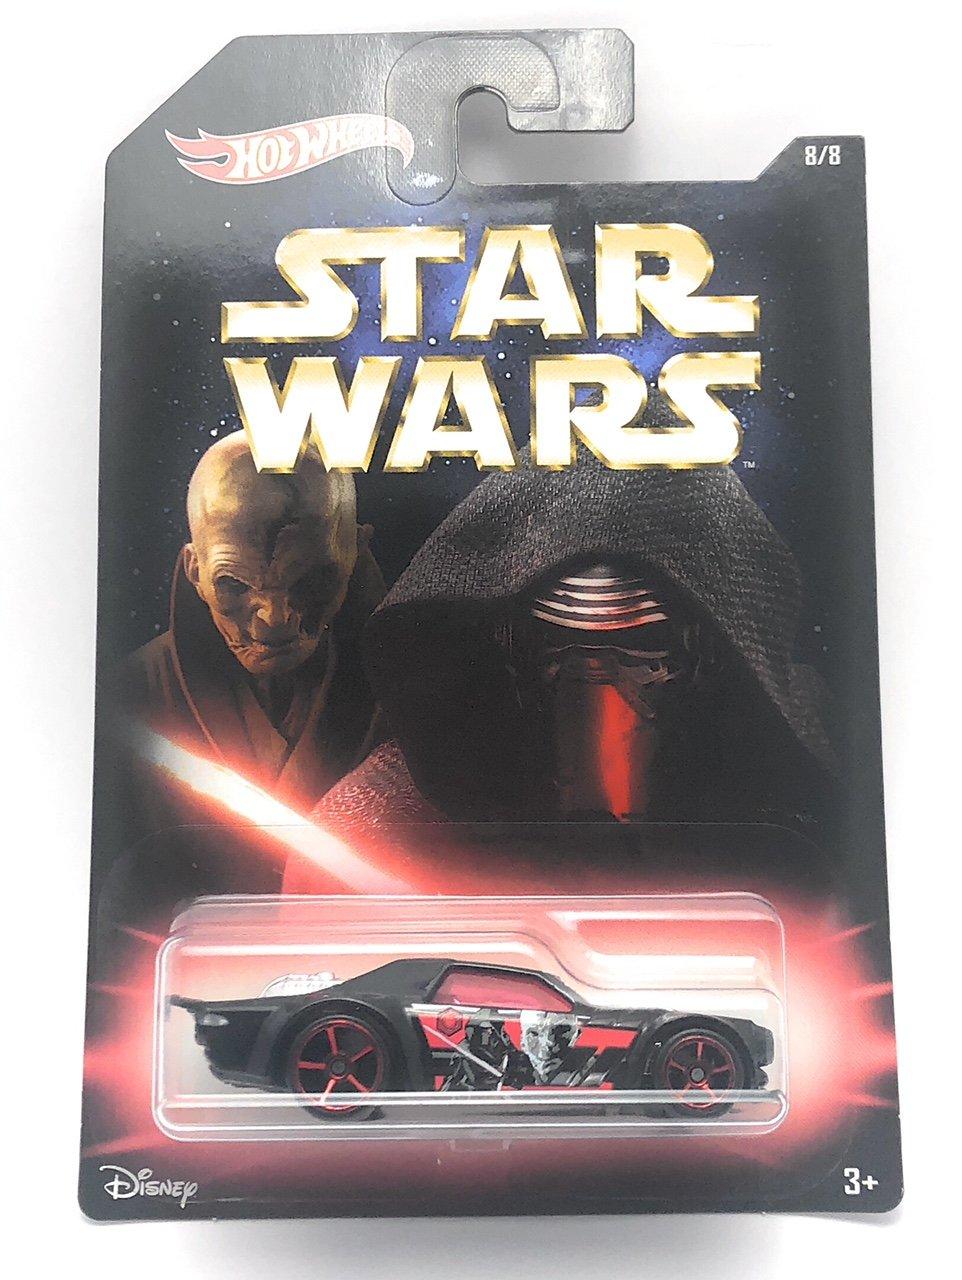 Hot Wheels Star Wars Variations 1//64 Scale Die Cast Cars 2//8 Master and Apprentice Asphalt Assault HW Series Diecasts